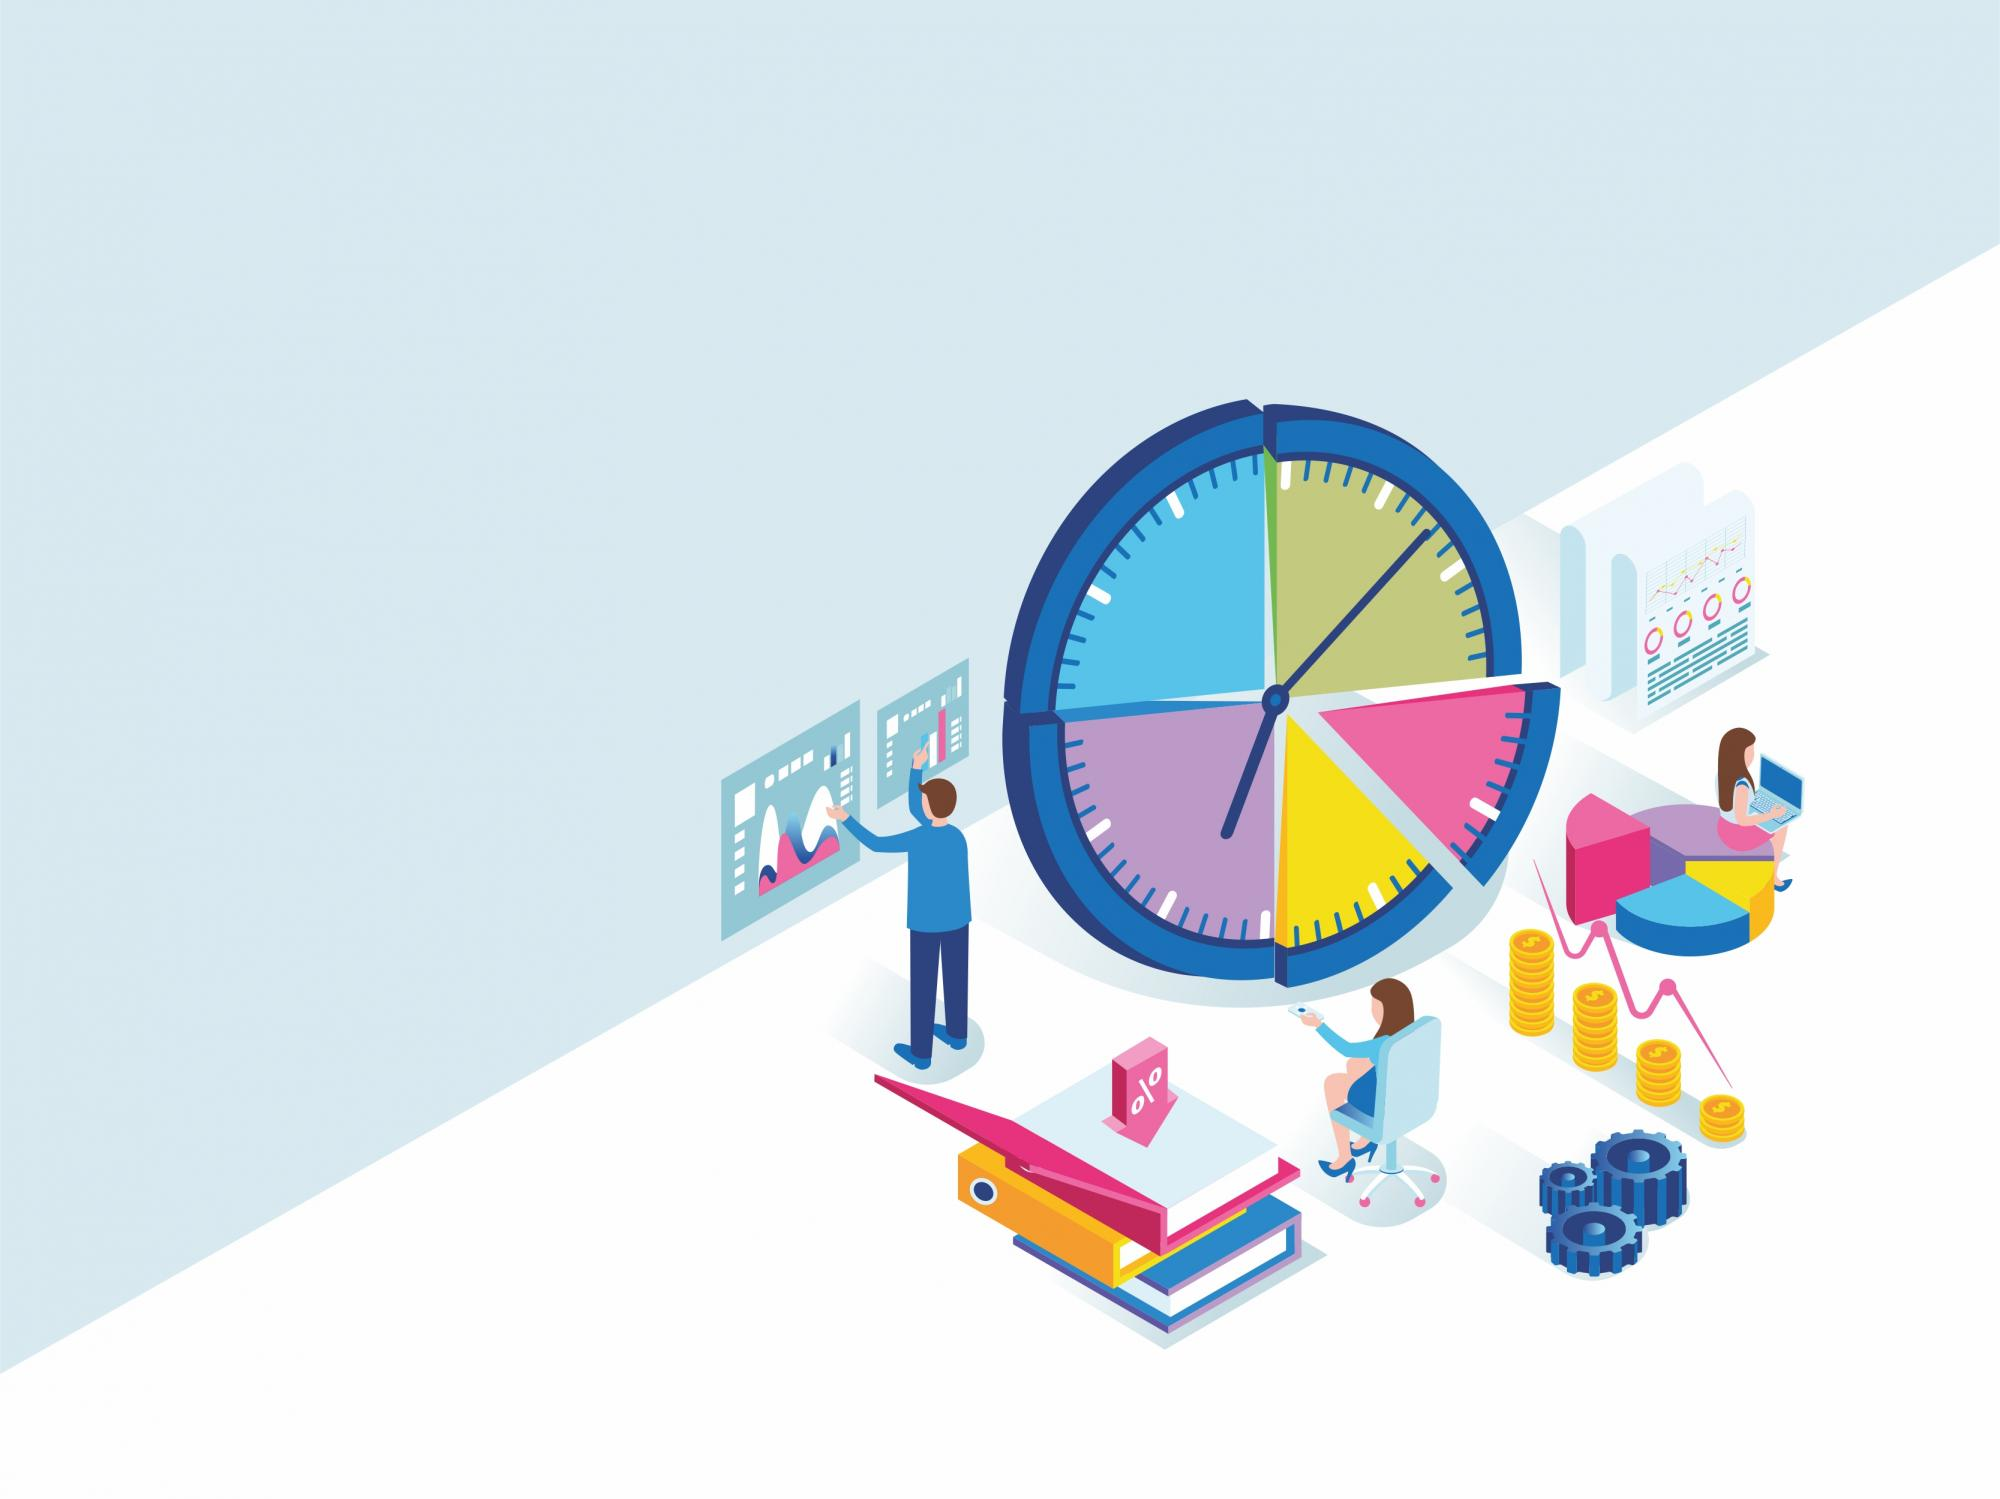 Оптимизация бизнес-процессов на раз-два-три: ликбез для руководителей